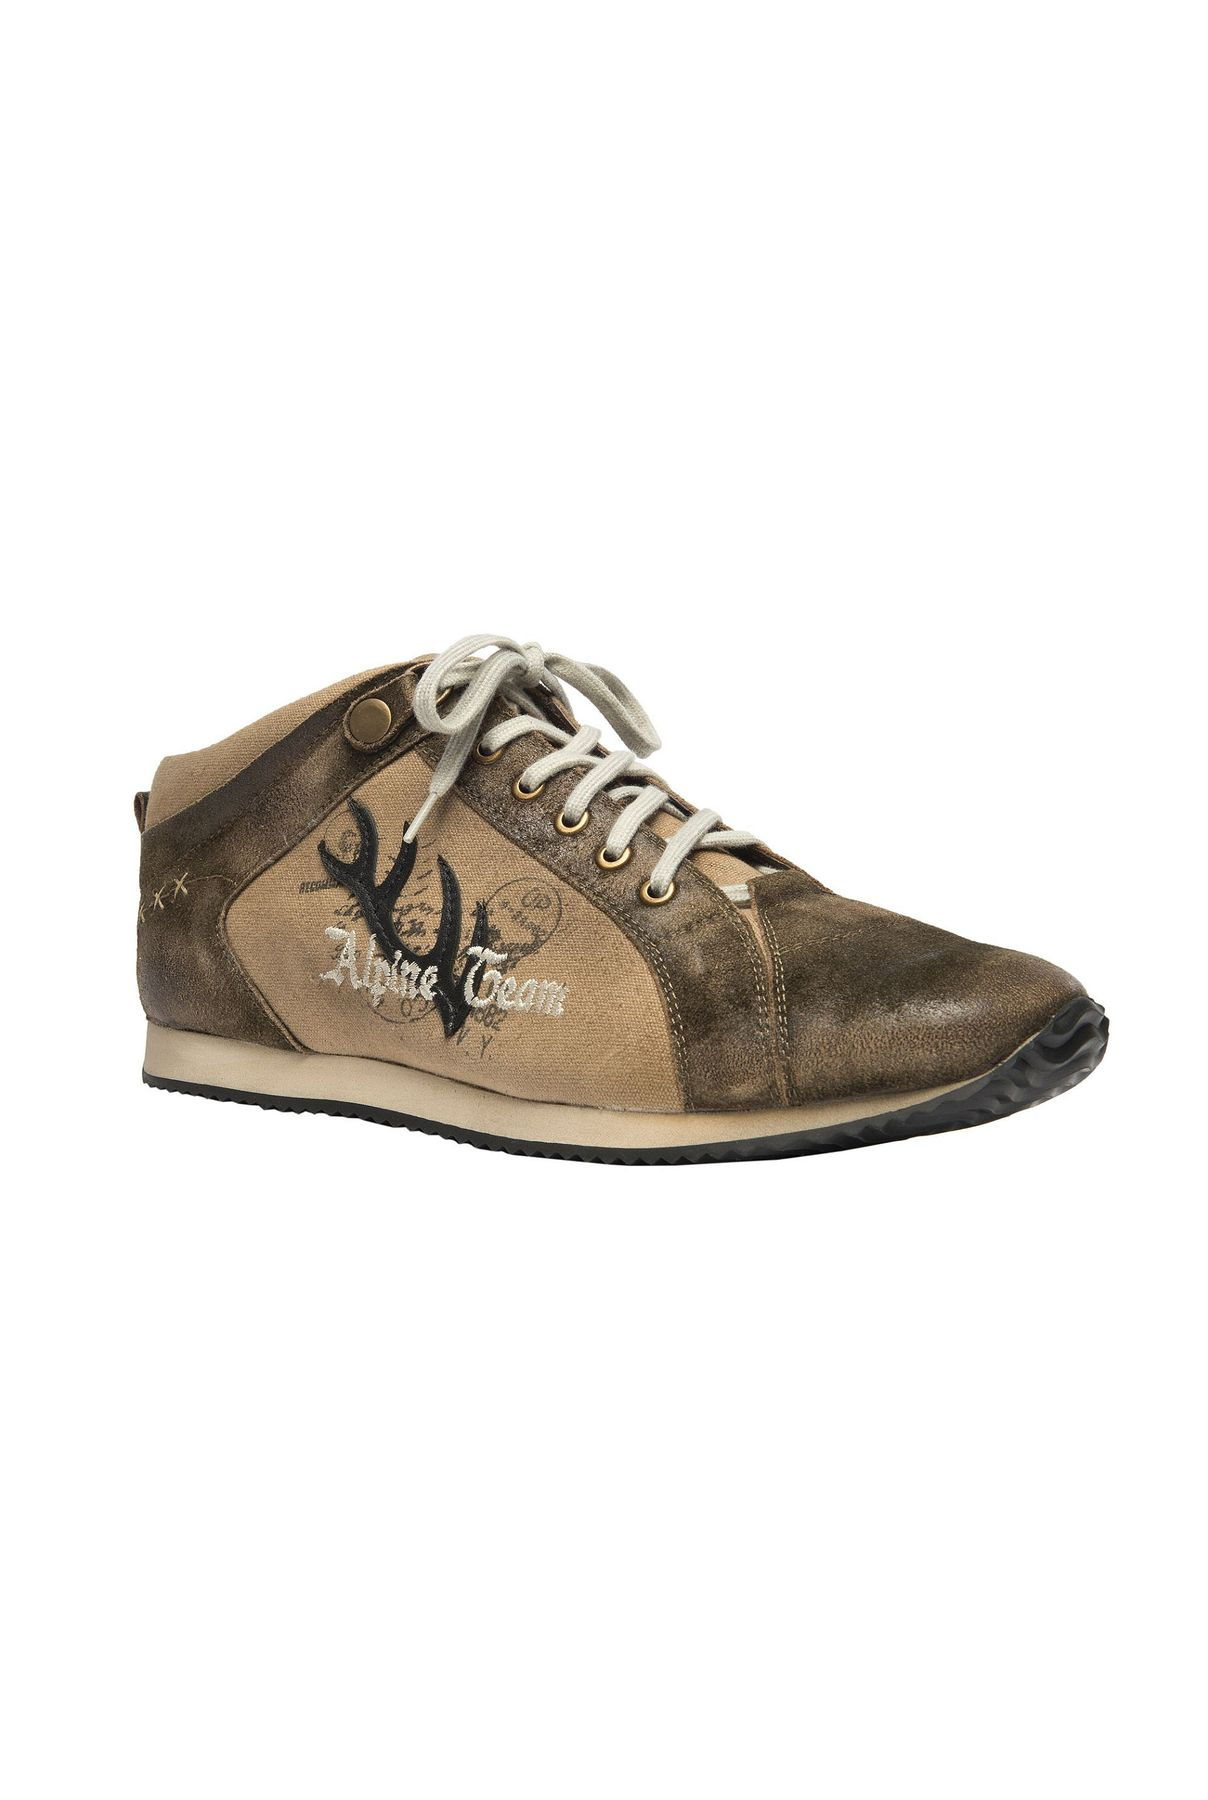 STOCKERPOINT - Herren Trachten Sneaker in Bison gespeckt, 1307 – Bild 1